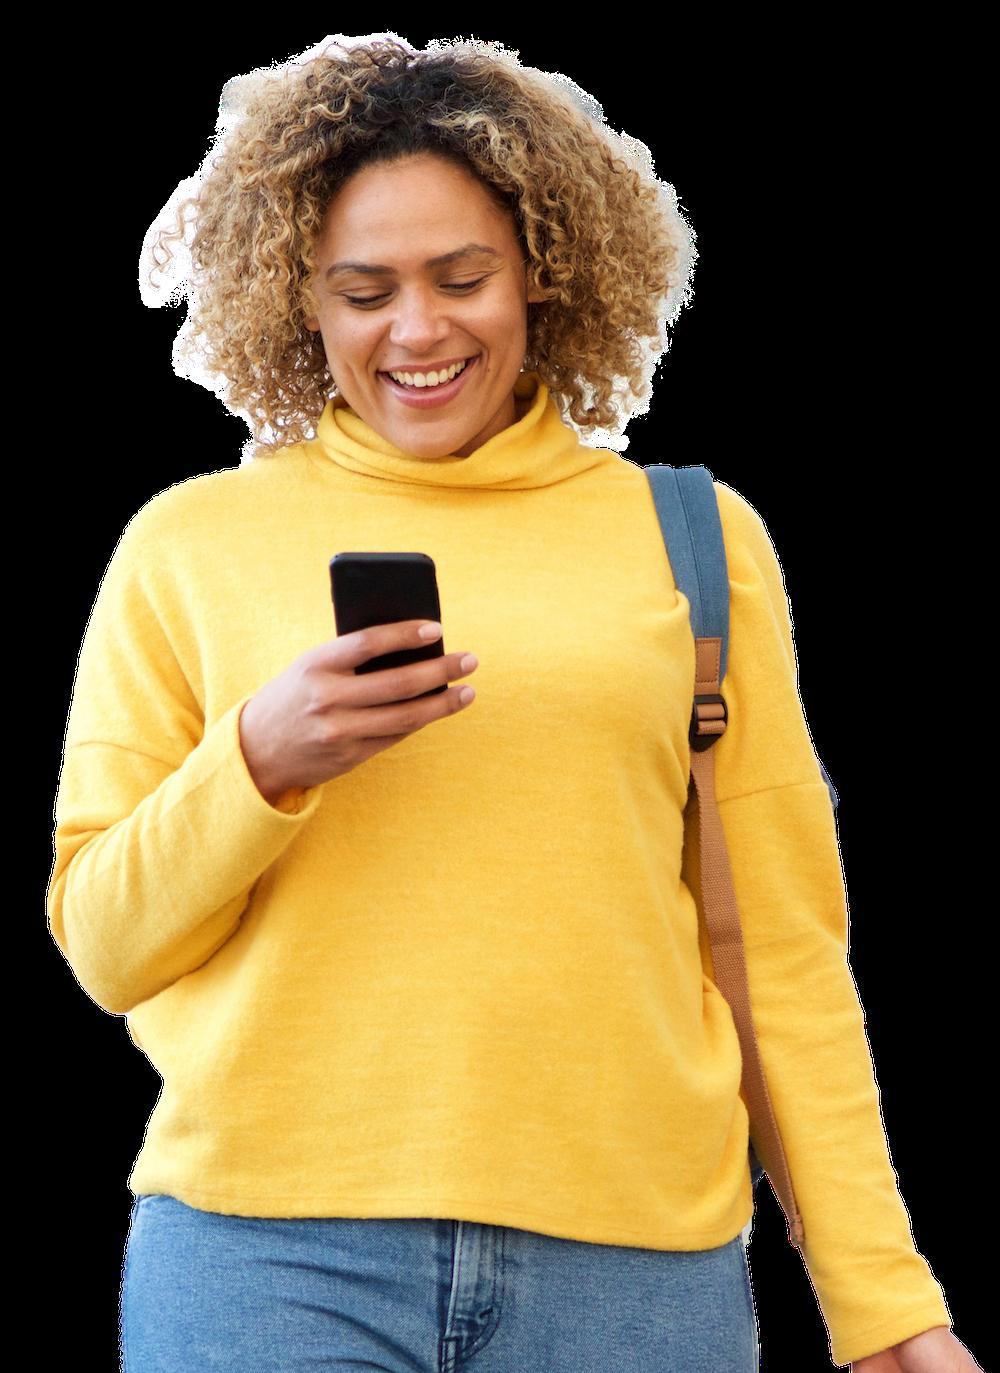 happy female customer provides feedback on phone